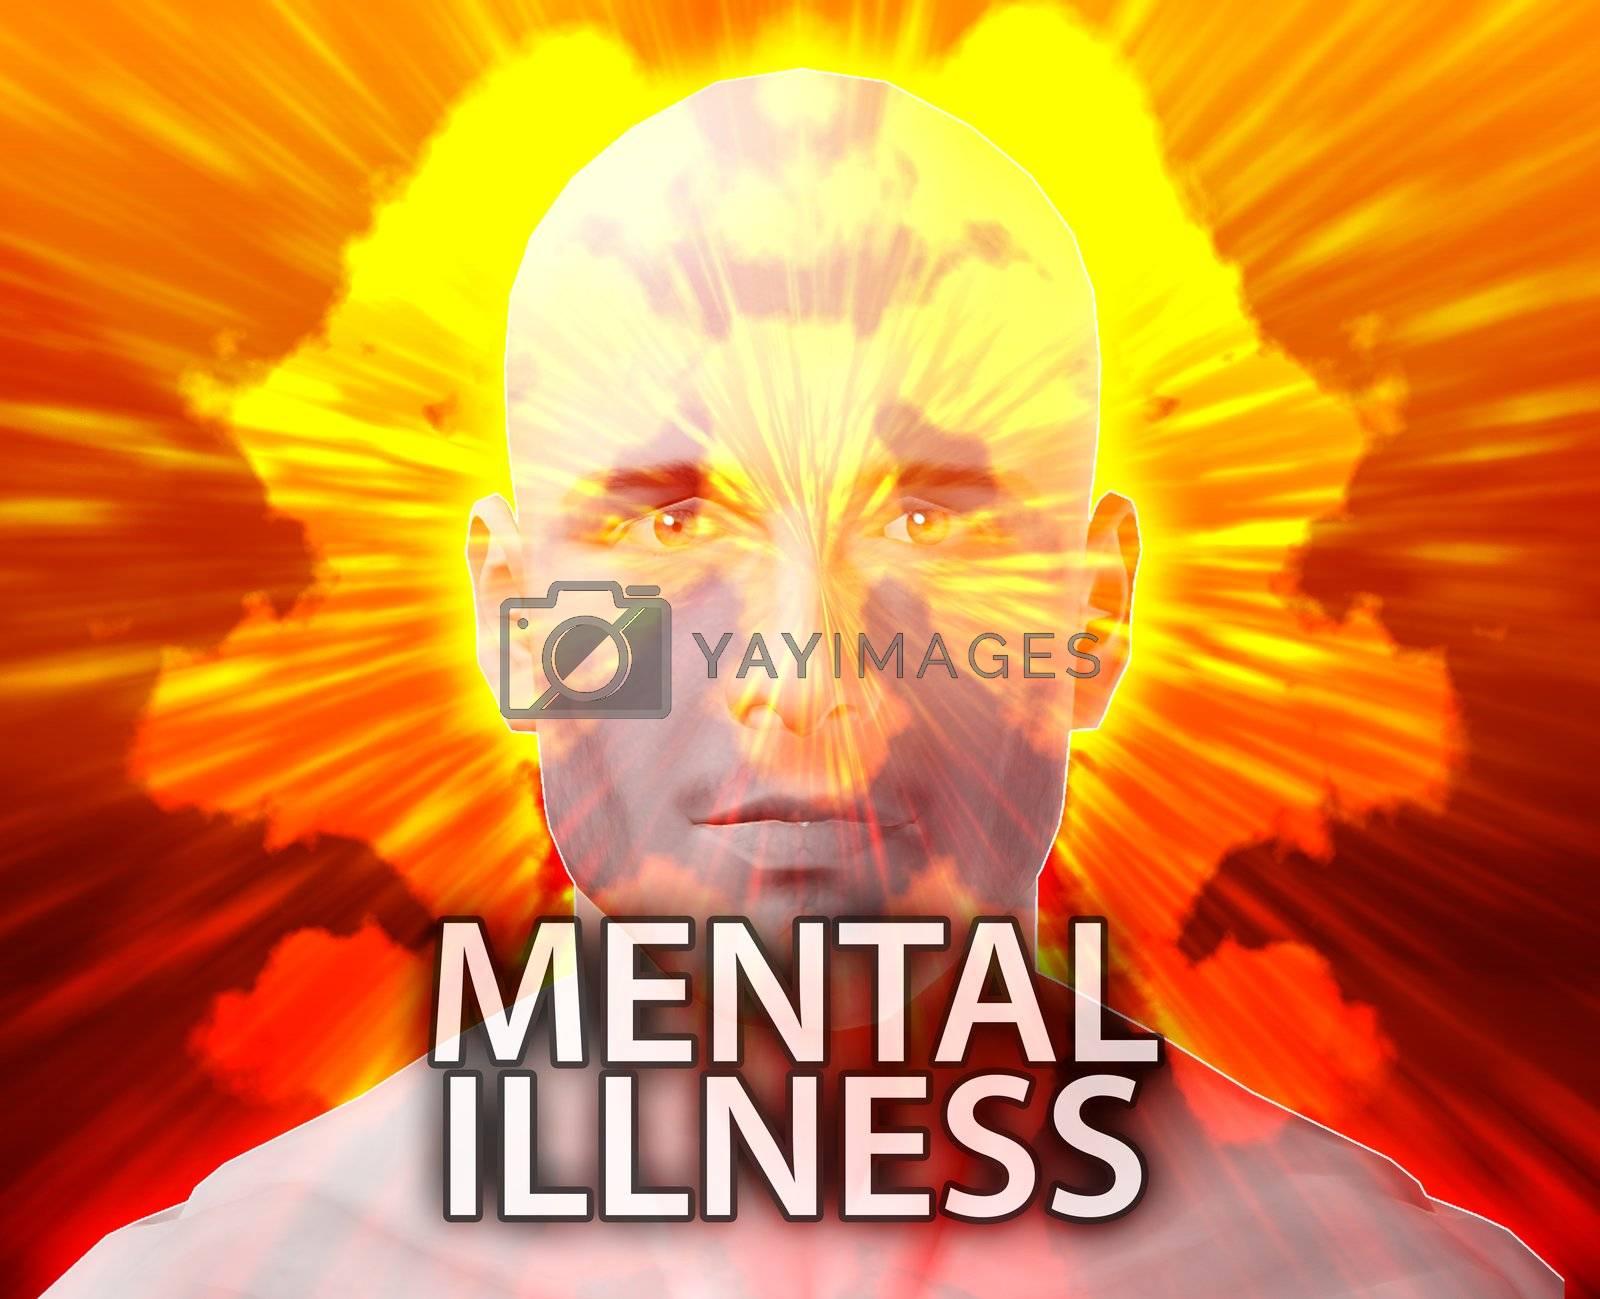 Male psychiatric treatment mental illness rorschach inkblot concept